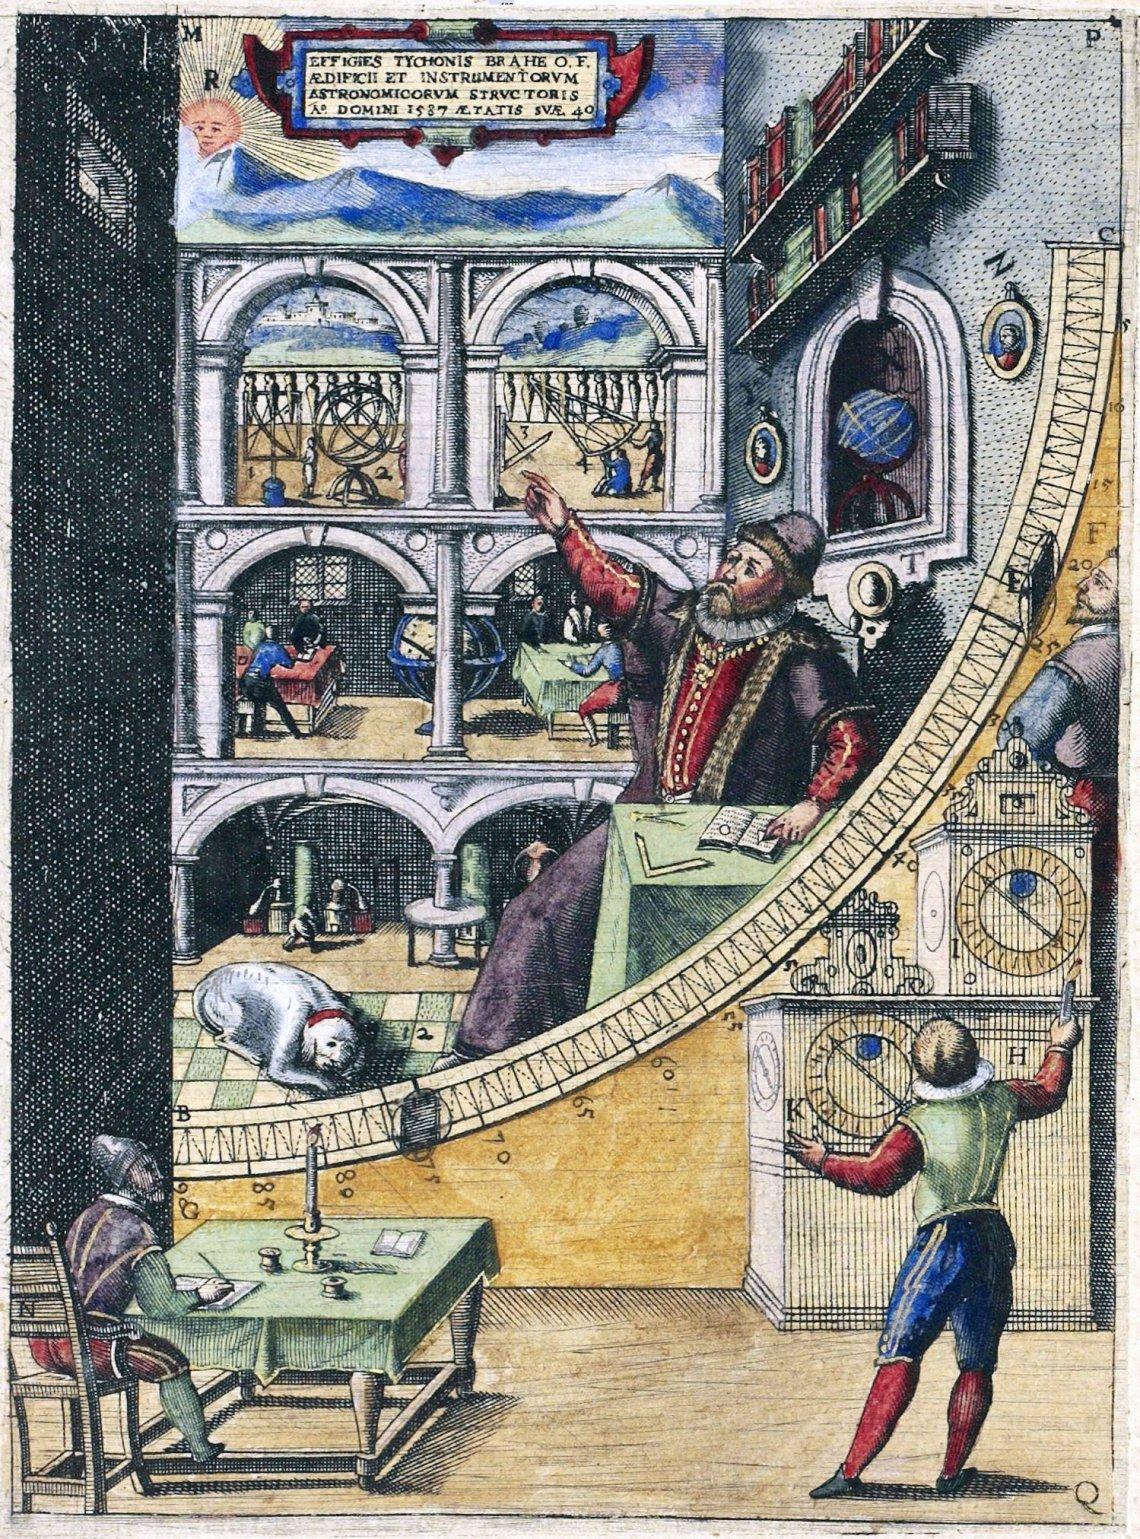 https://commons.wikimedia.org/wiki/File:Tycho-Brahe-Mural-Quadrant.jpg